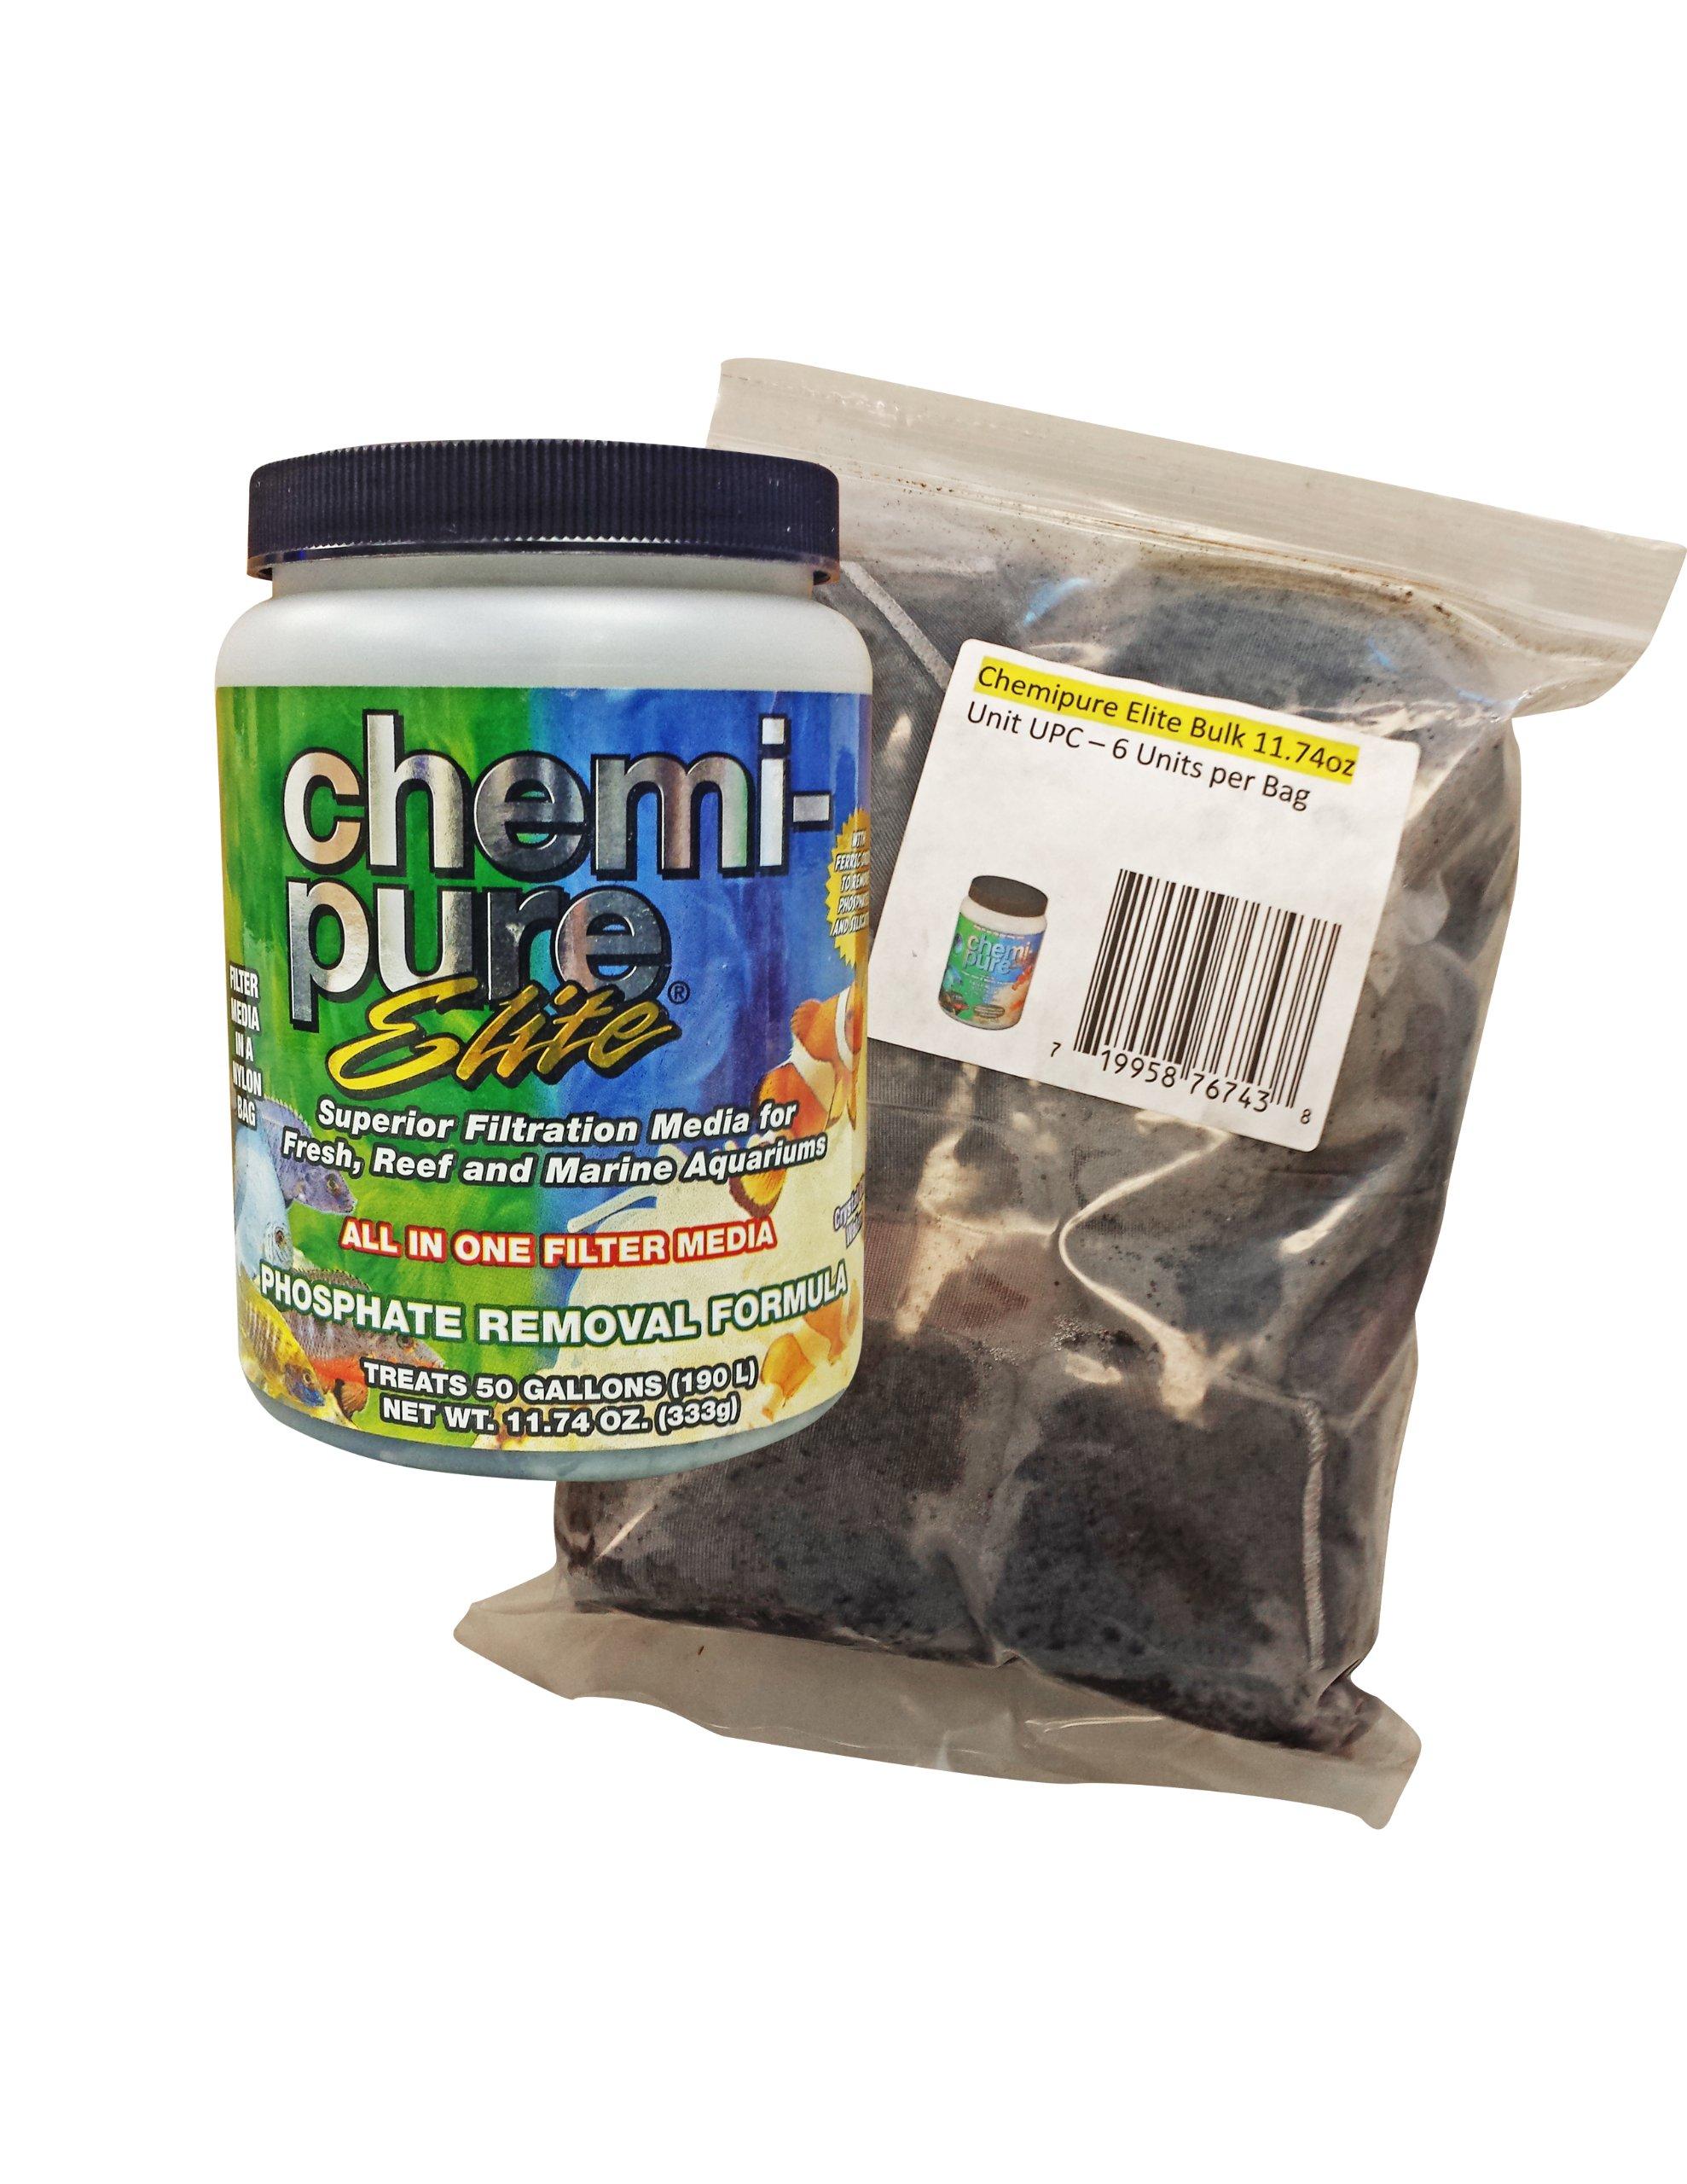 Boyd Enterprises ABE767438 Chemi Elite Bulk for Aquarium, 11.74-Ounce